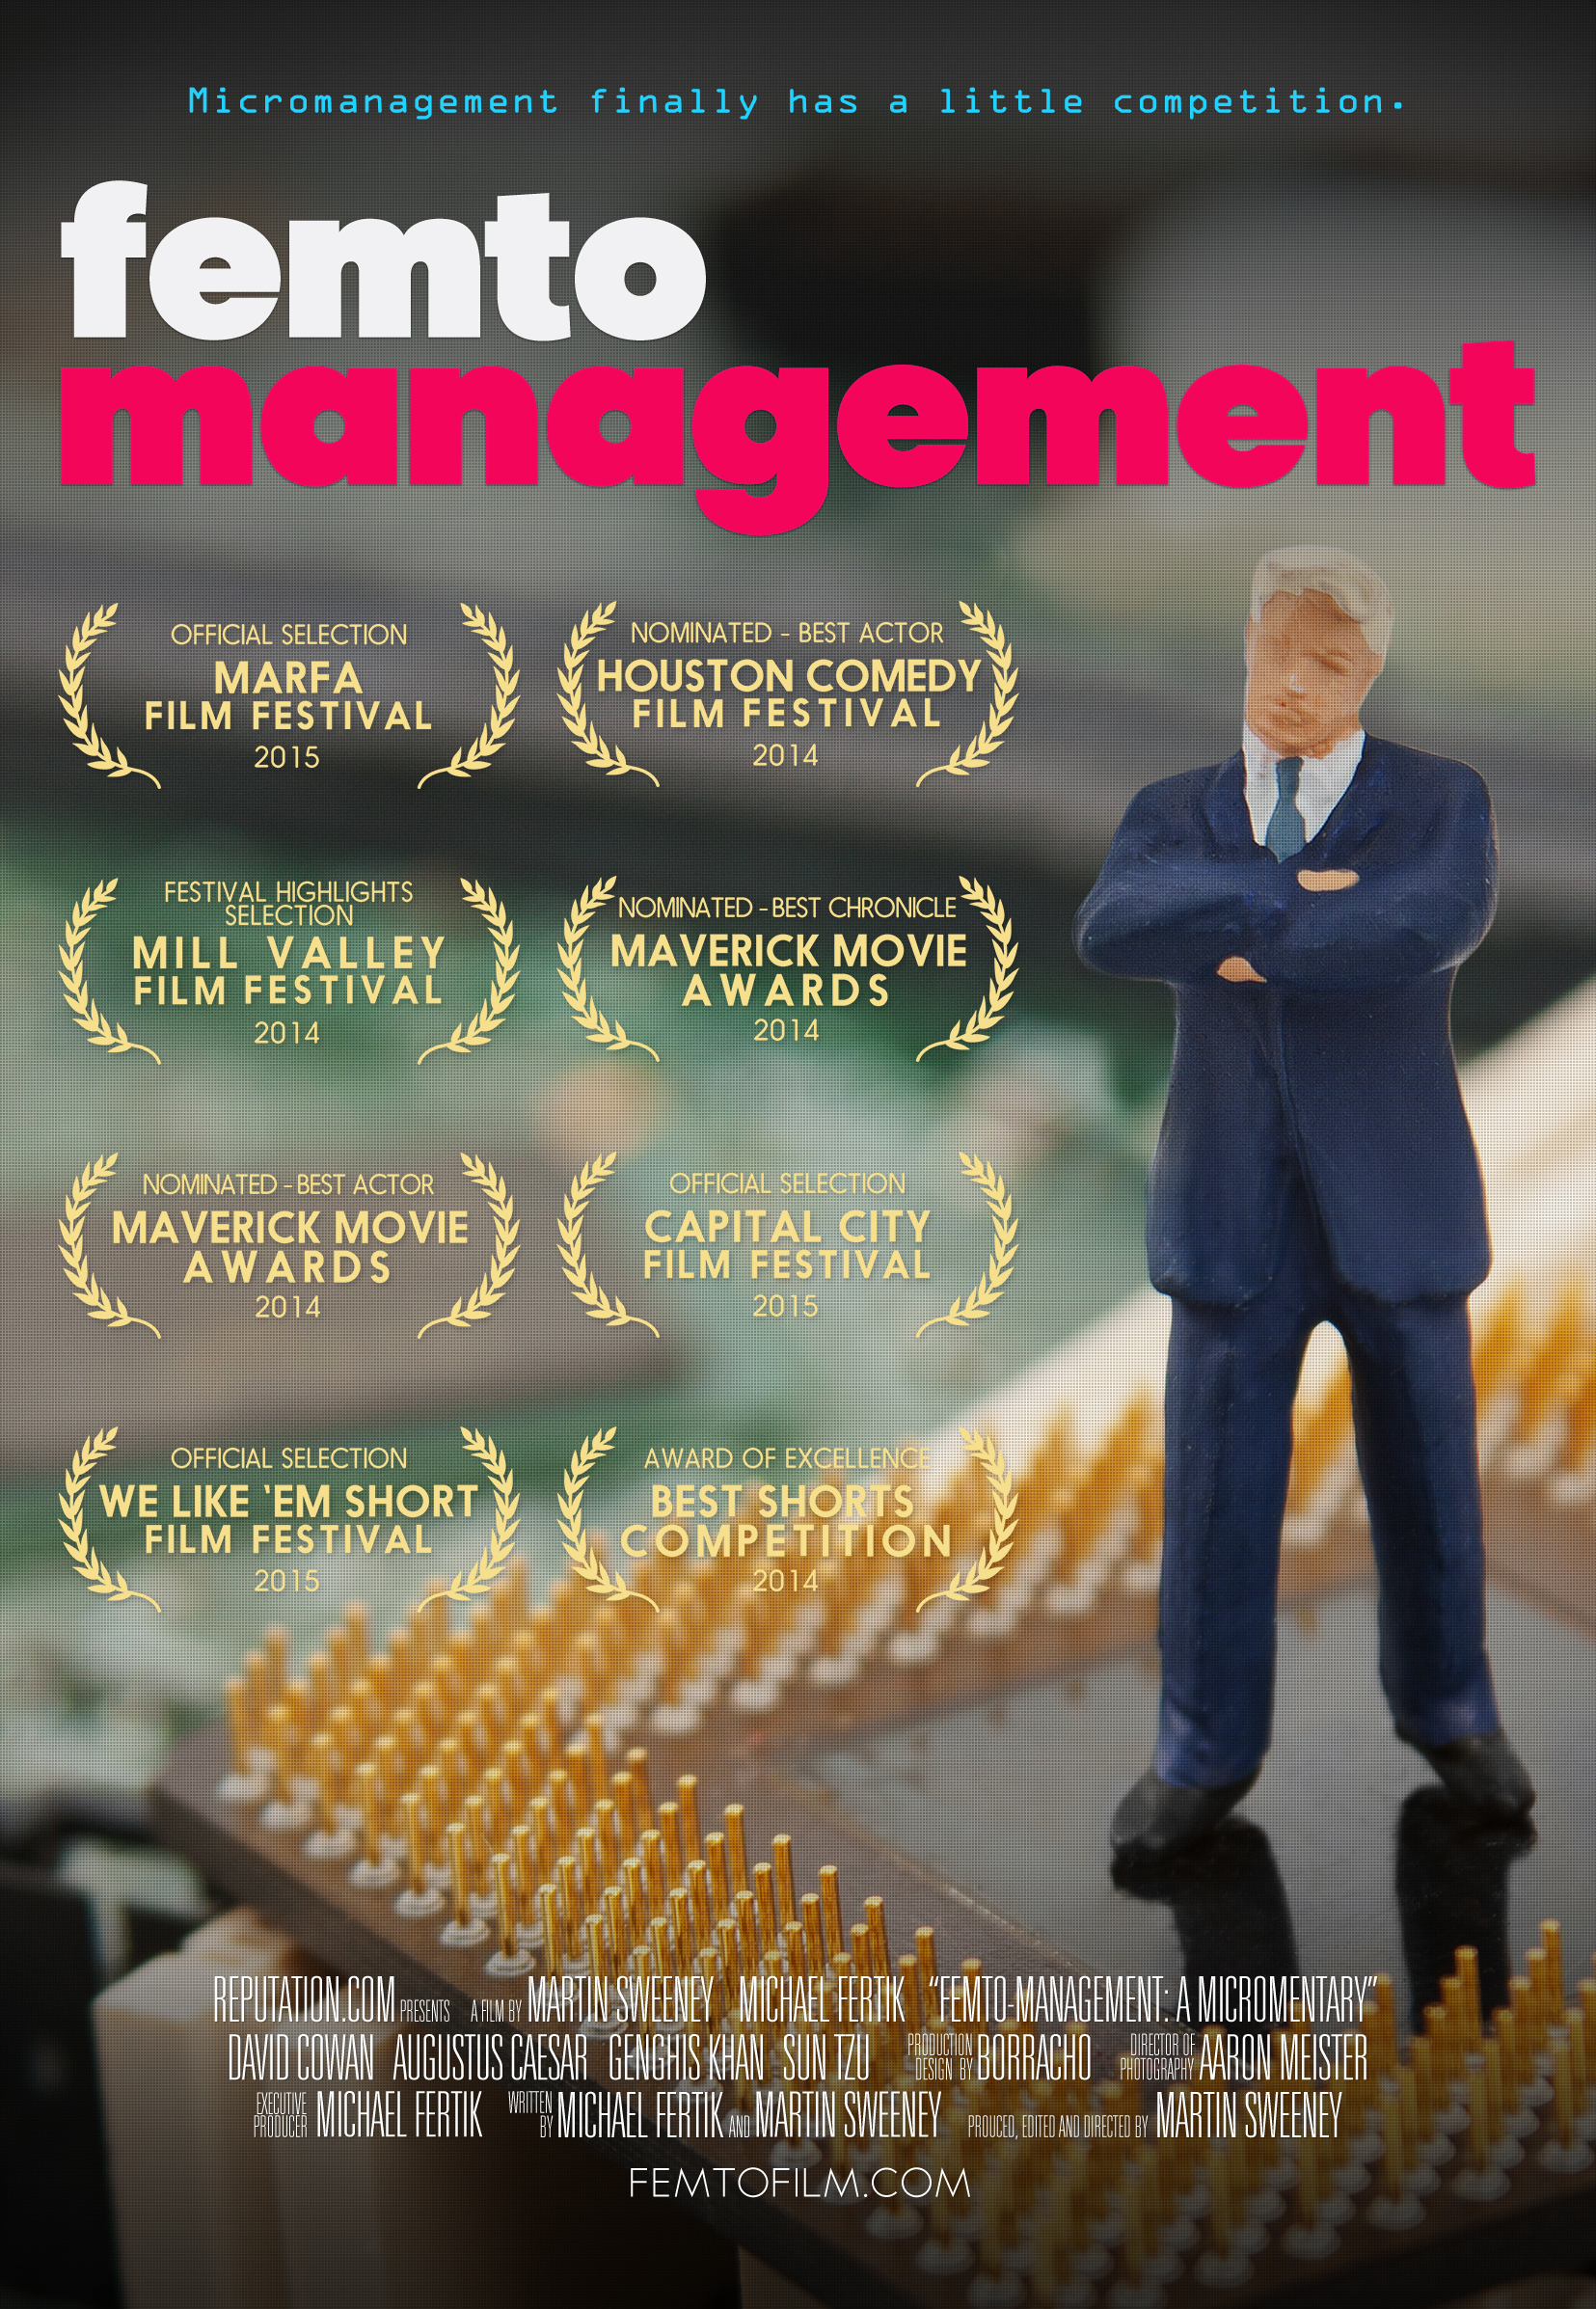 Femto-Management - A MICROMENTARY